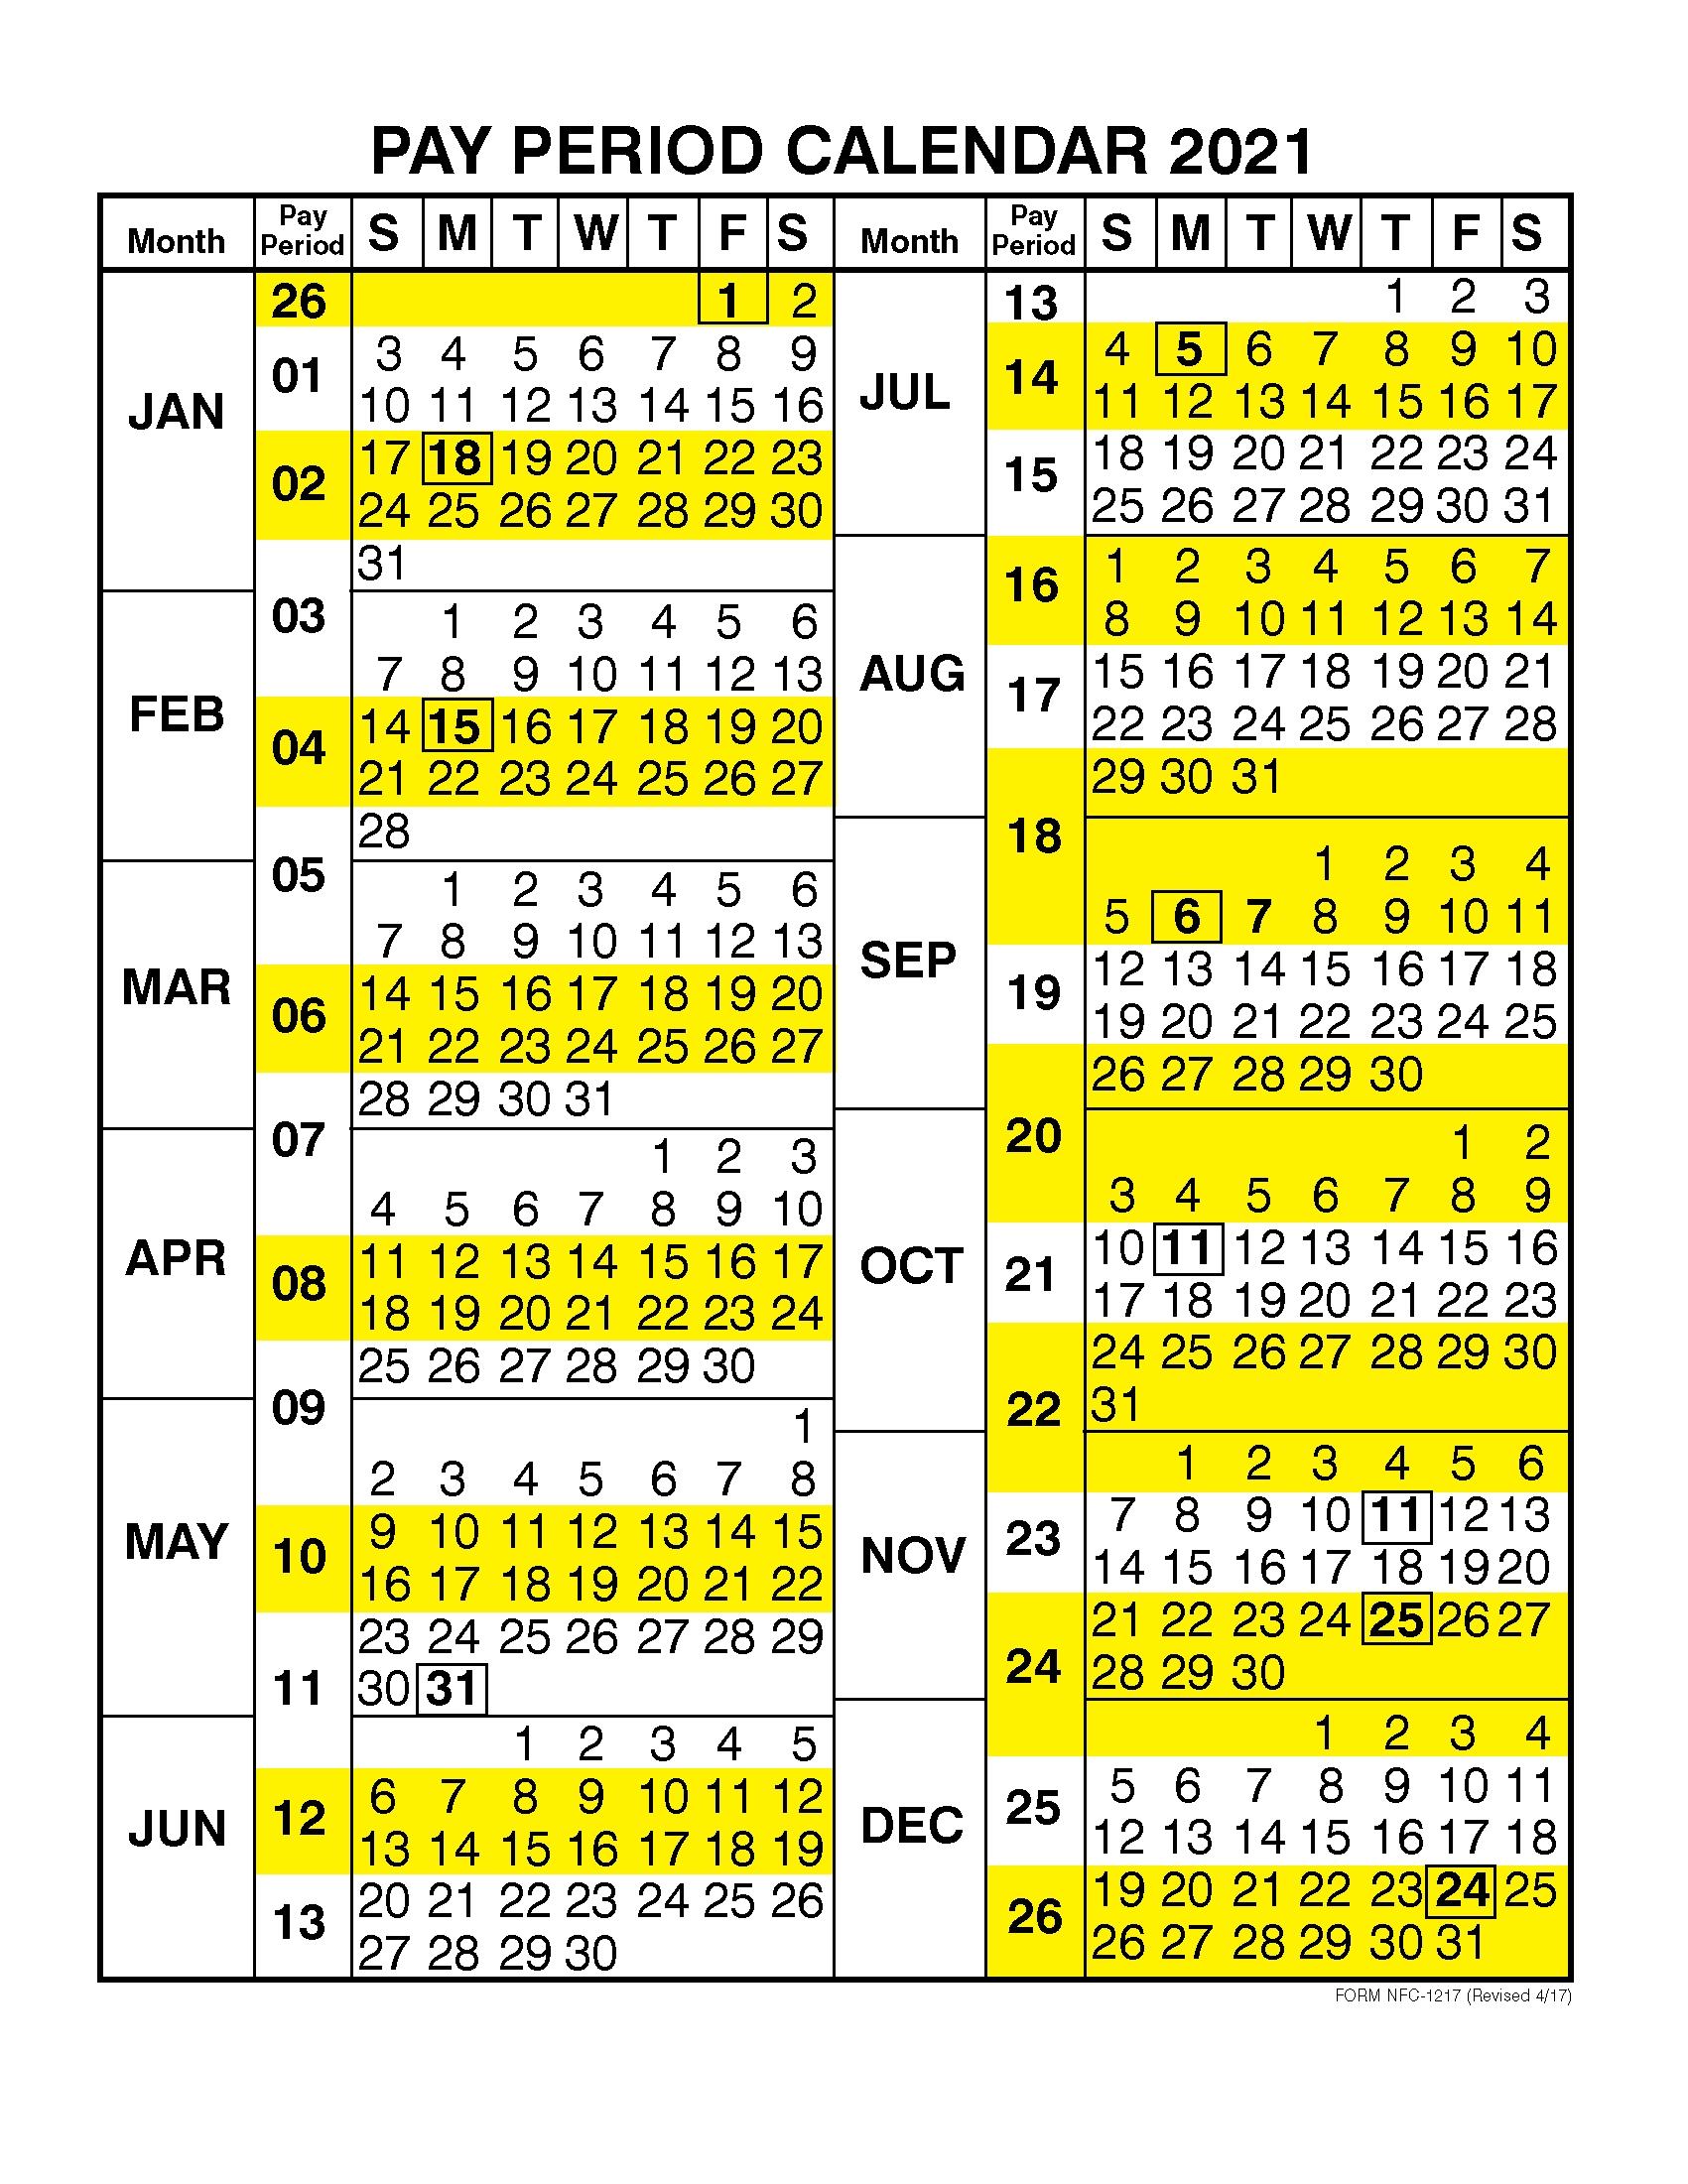 Take Federal Pay Period Calendar 2021